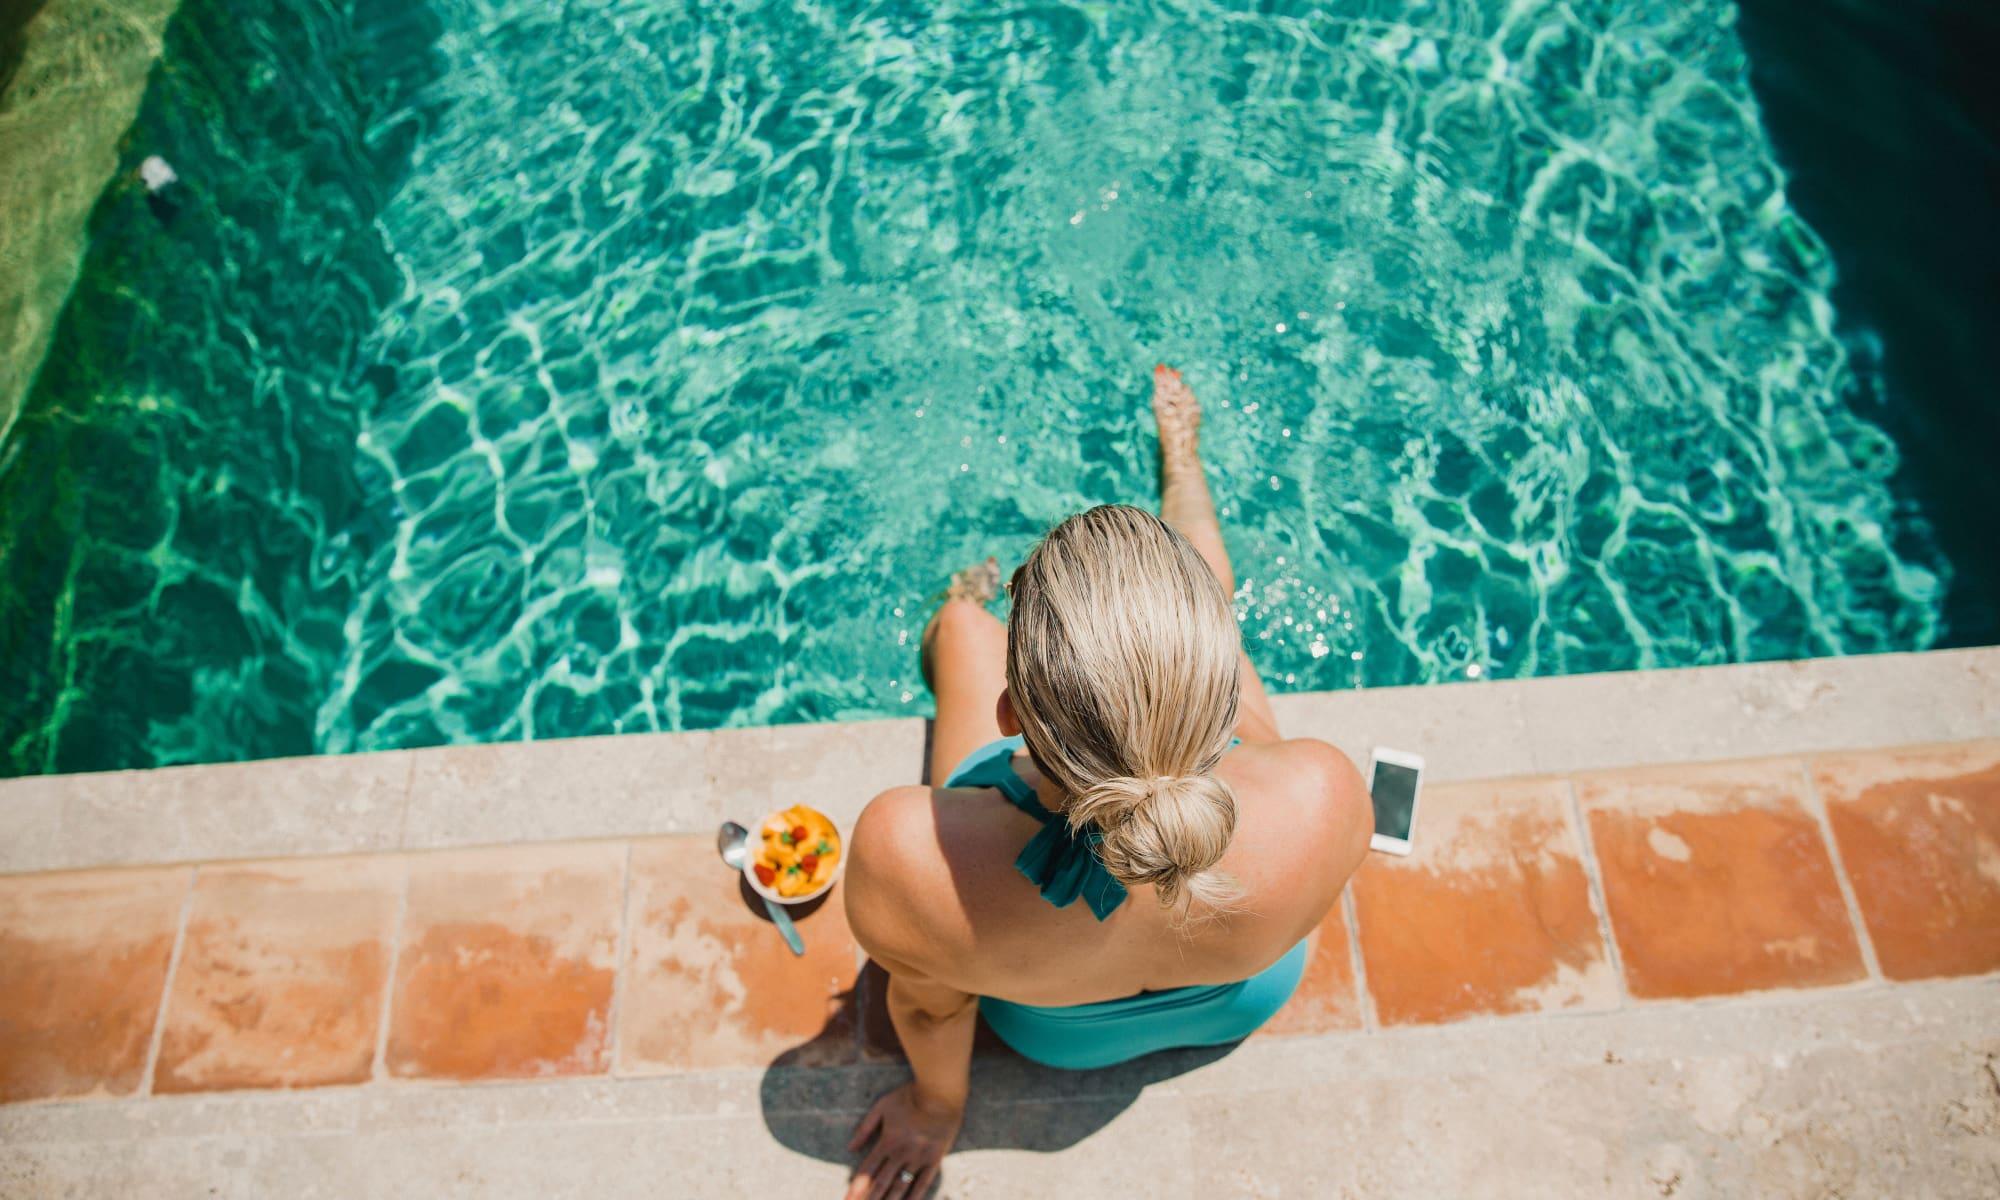 Sparkling pool at Avilla Meadows in Surprise, Arizona